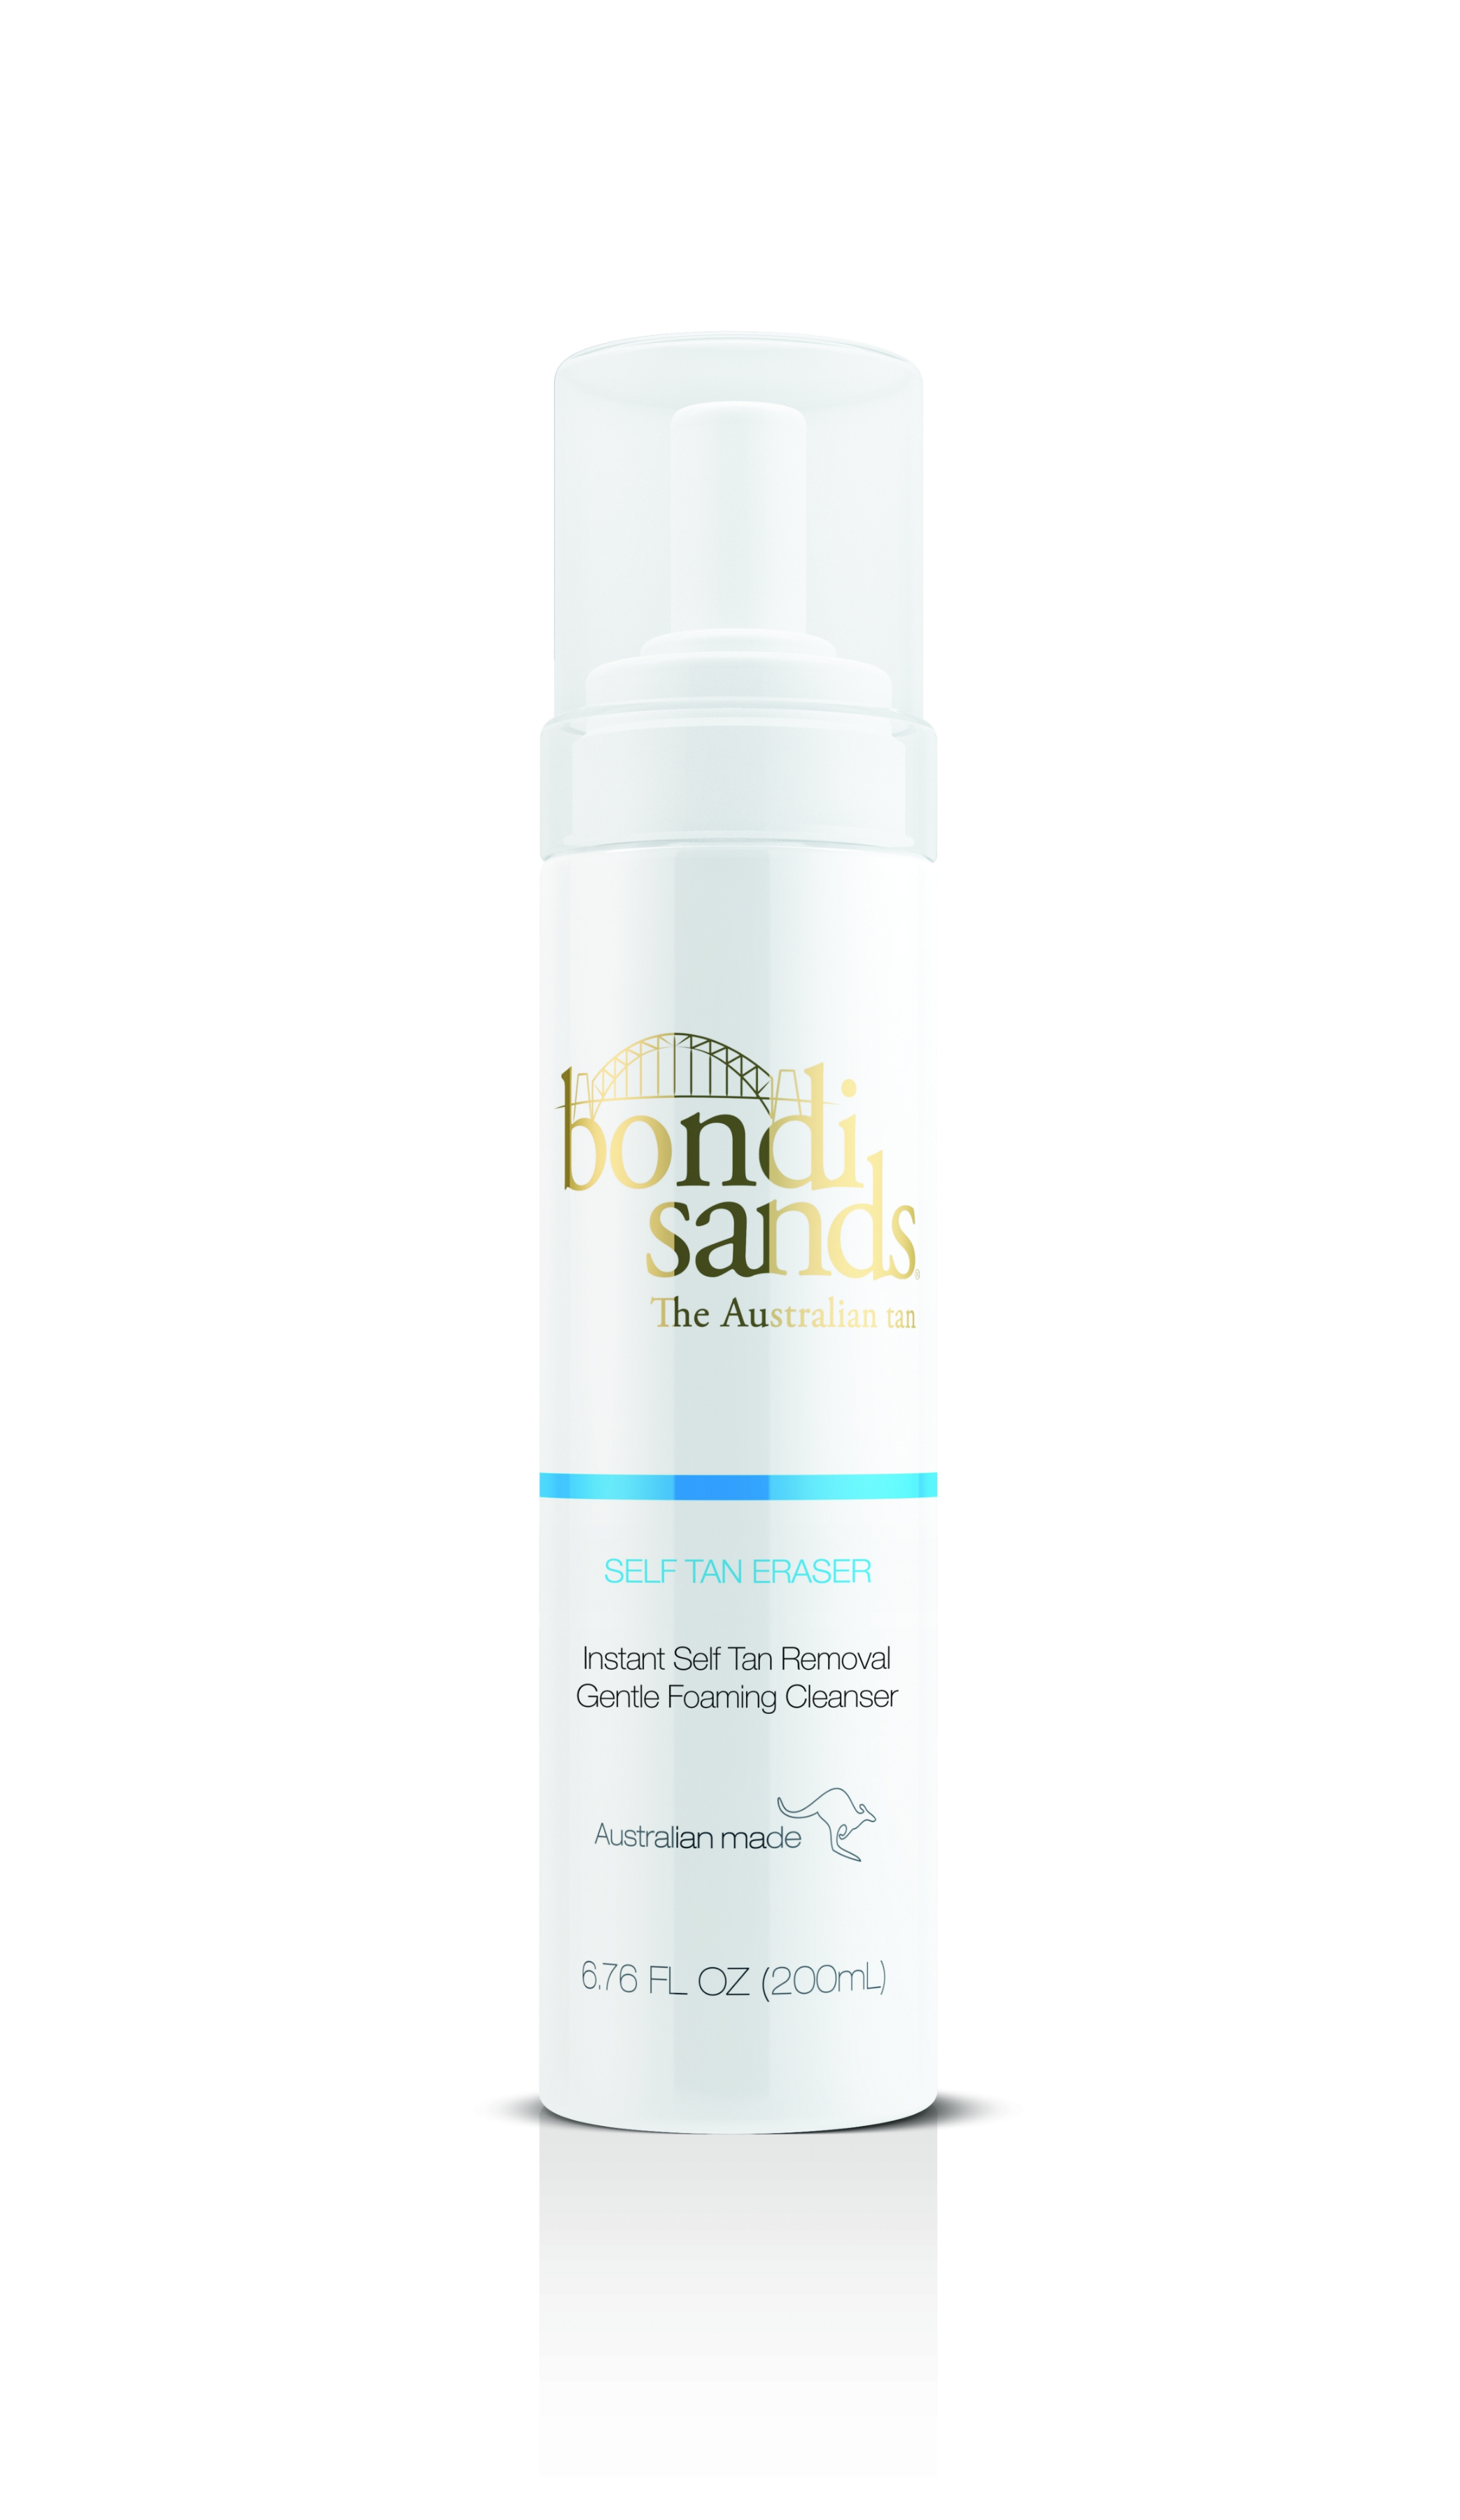 Bondi Sands Self Tan Eraser, RRP$24.99